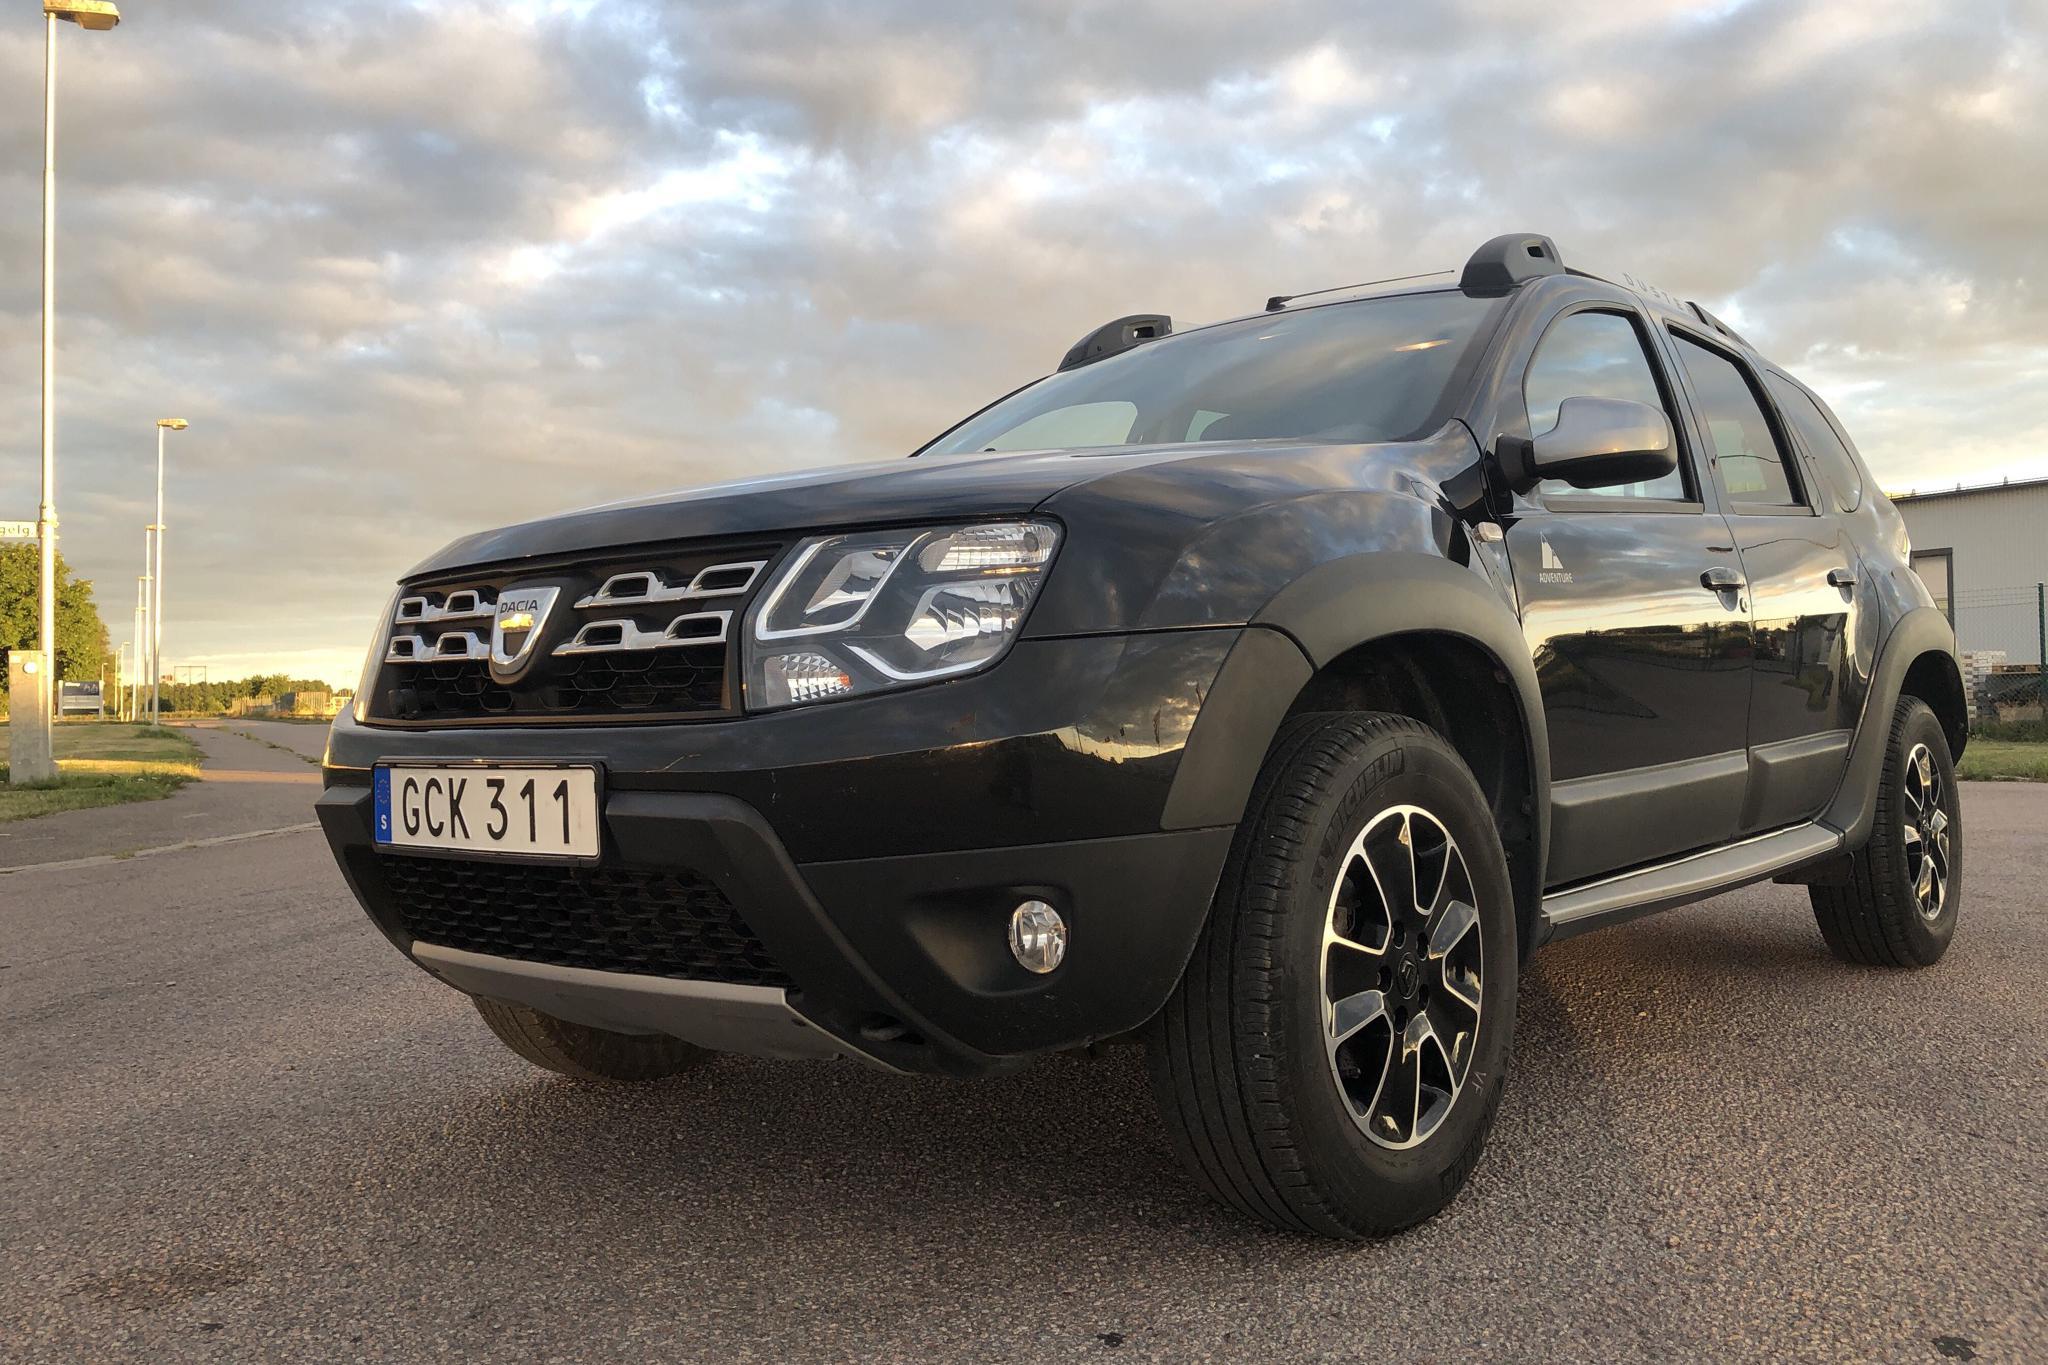 Dacia Duster 1.5 dCi 4x4 (109hk) - 70 920 km - Manual - black - 2016